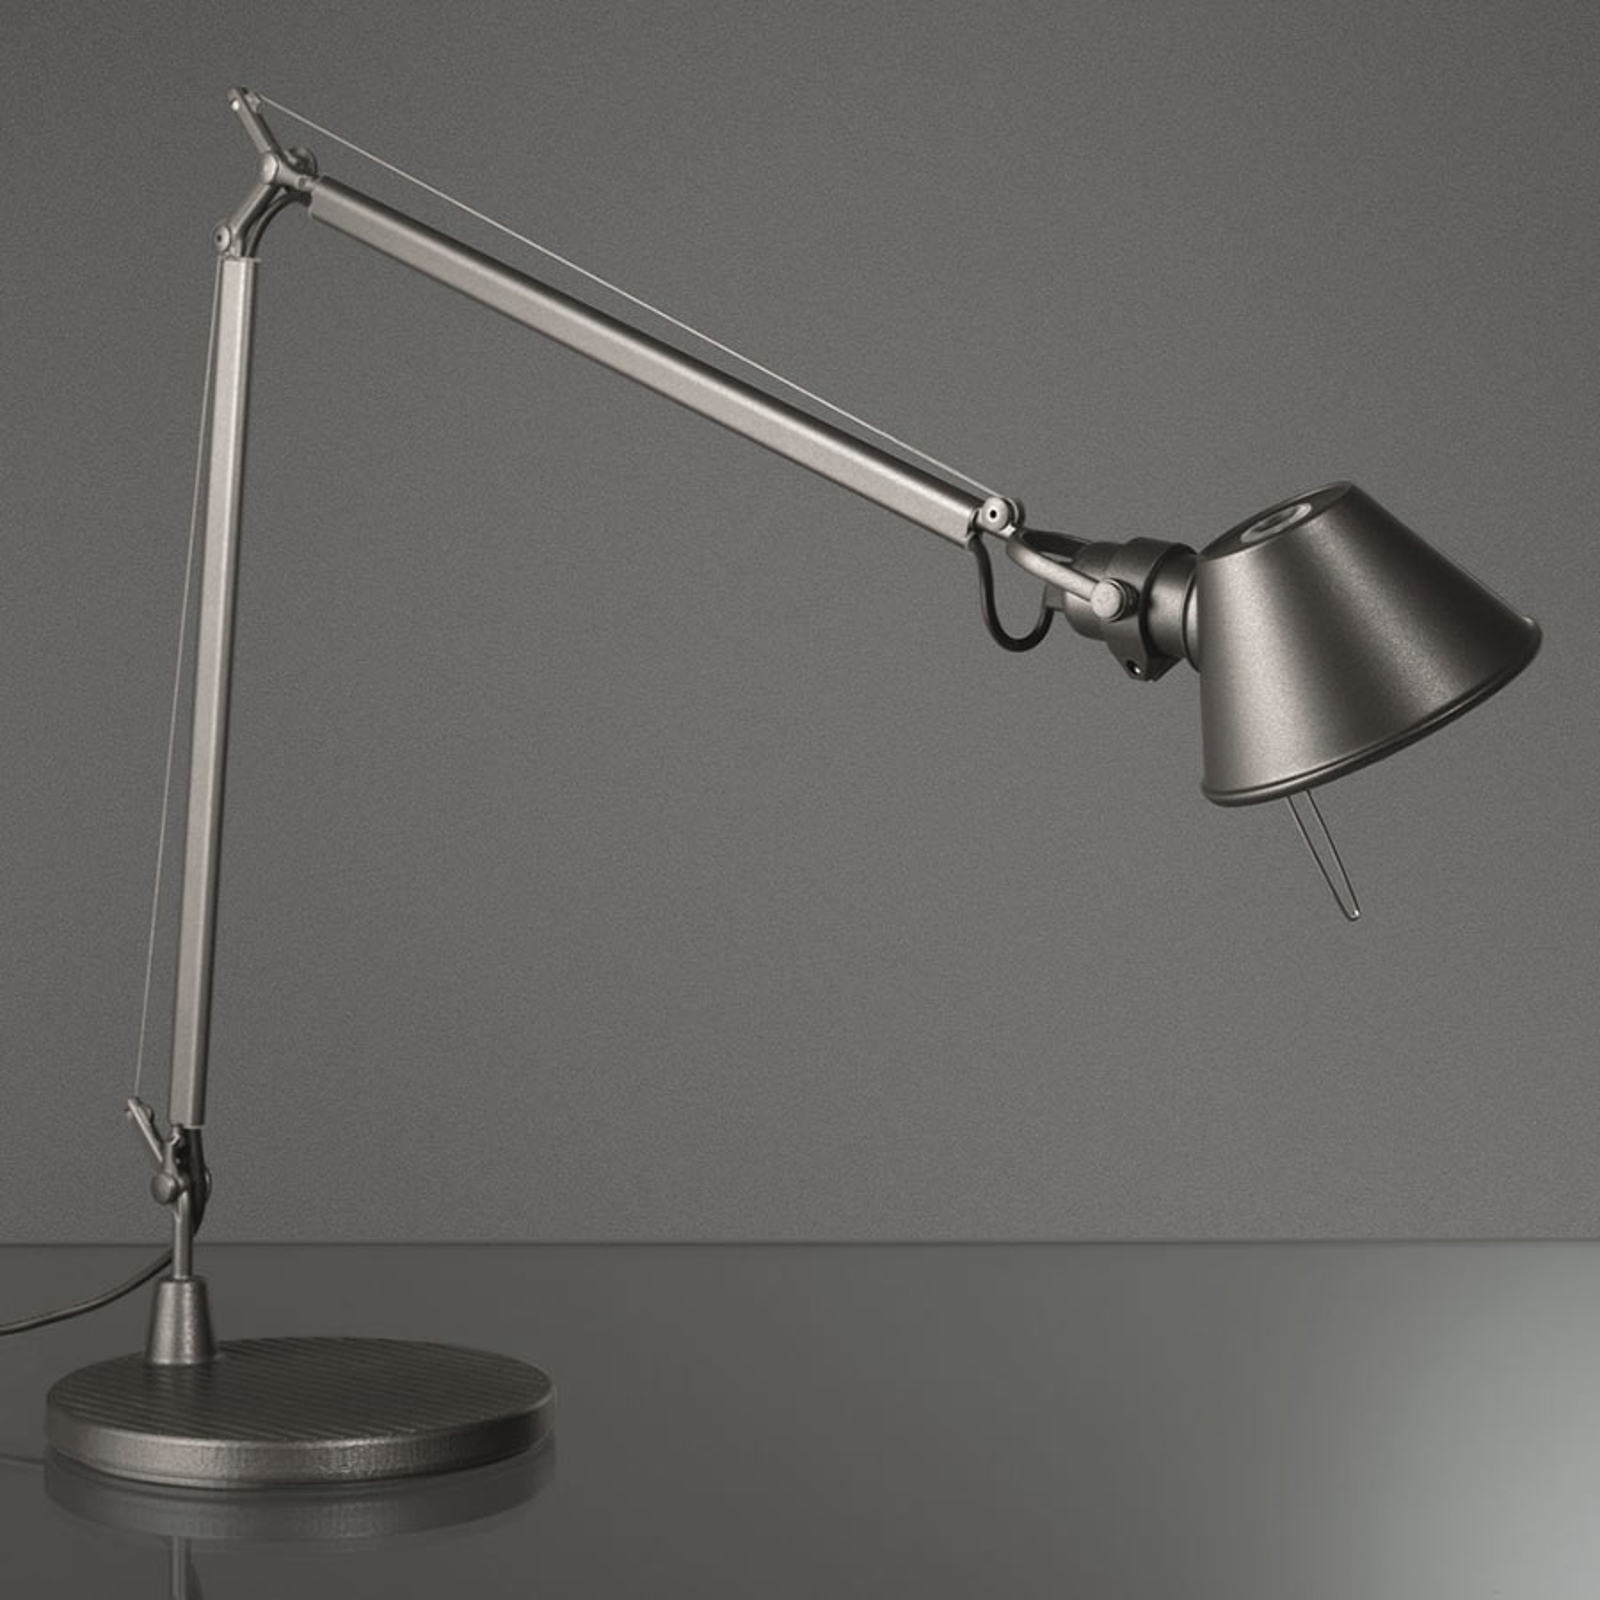 Artemide Tolomeo Midi LED-bordslampa, 3 000 K grå